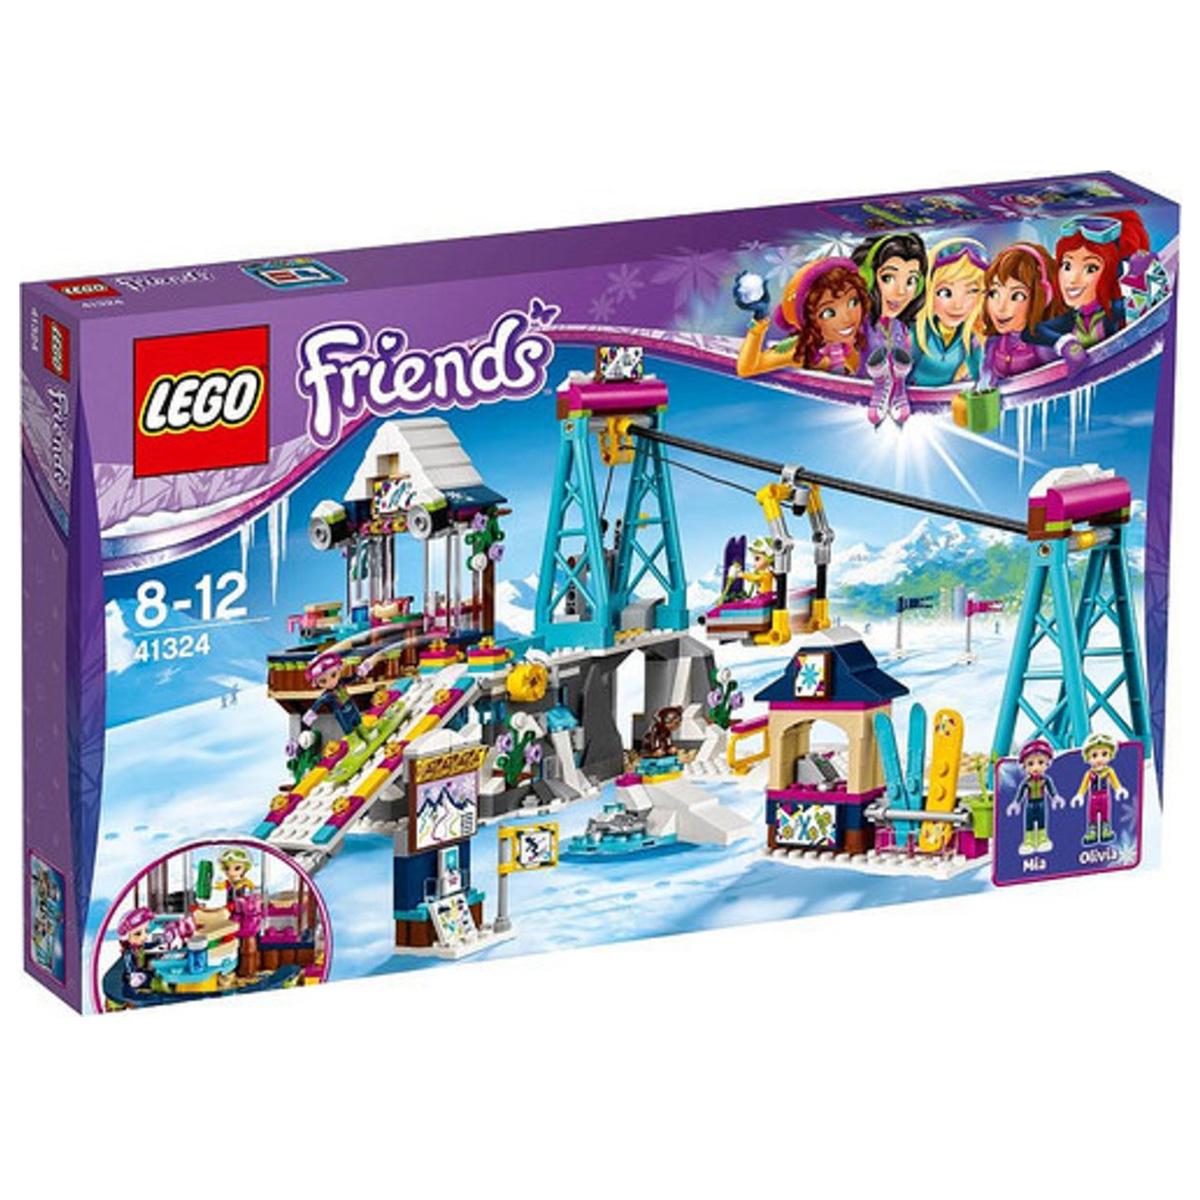 75efa669a65f7 Lego ADR-LGF41324 Lego Friends Kayak Tesisi Teleferiği Seti 8-12 Yaş ...